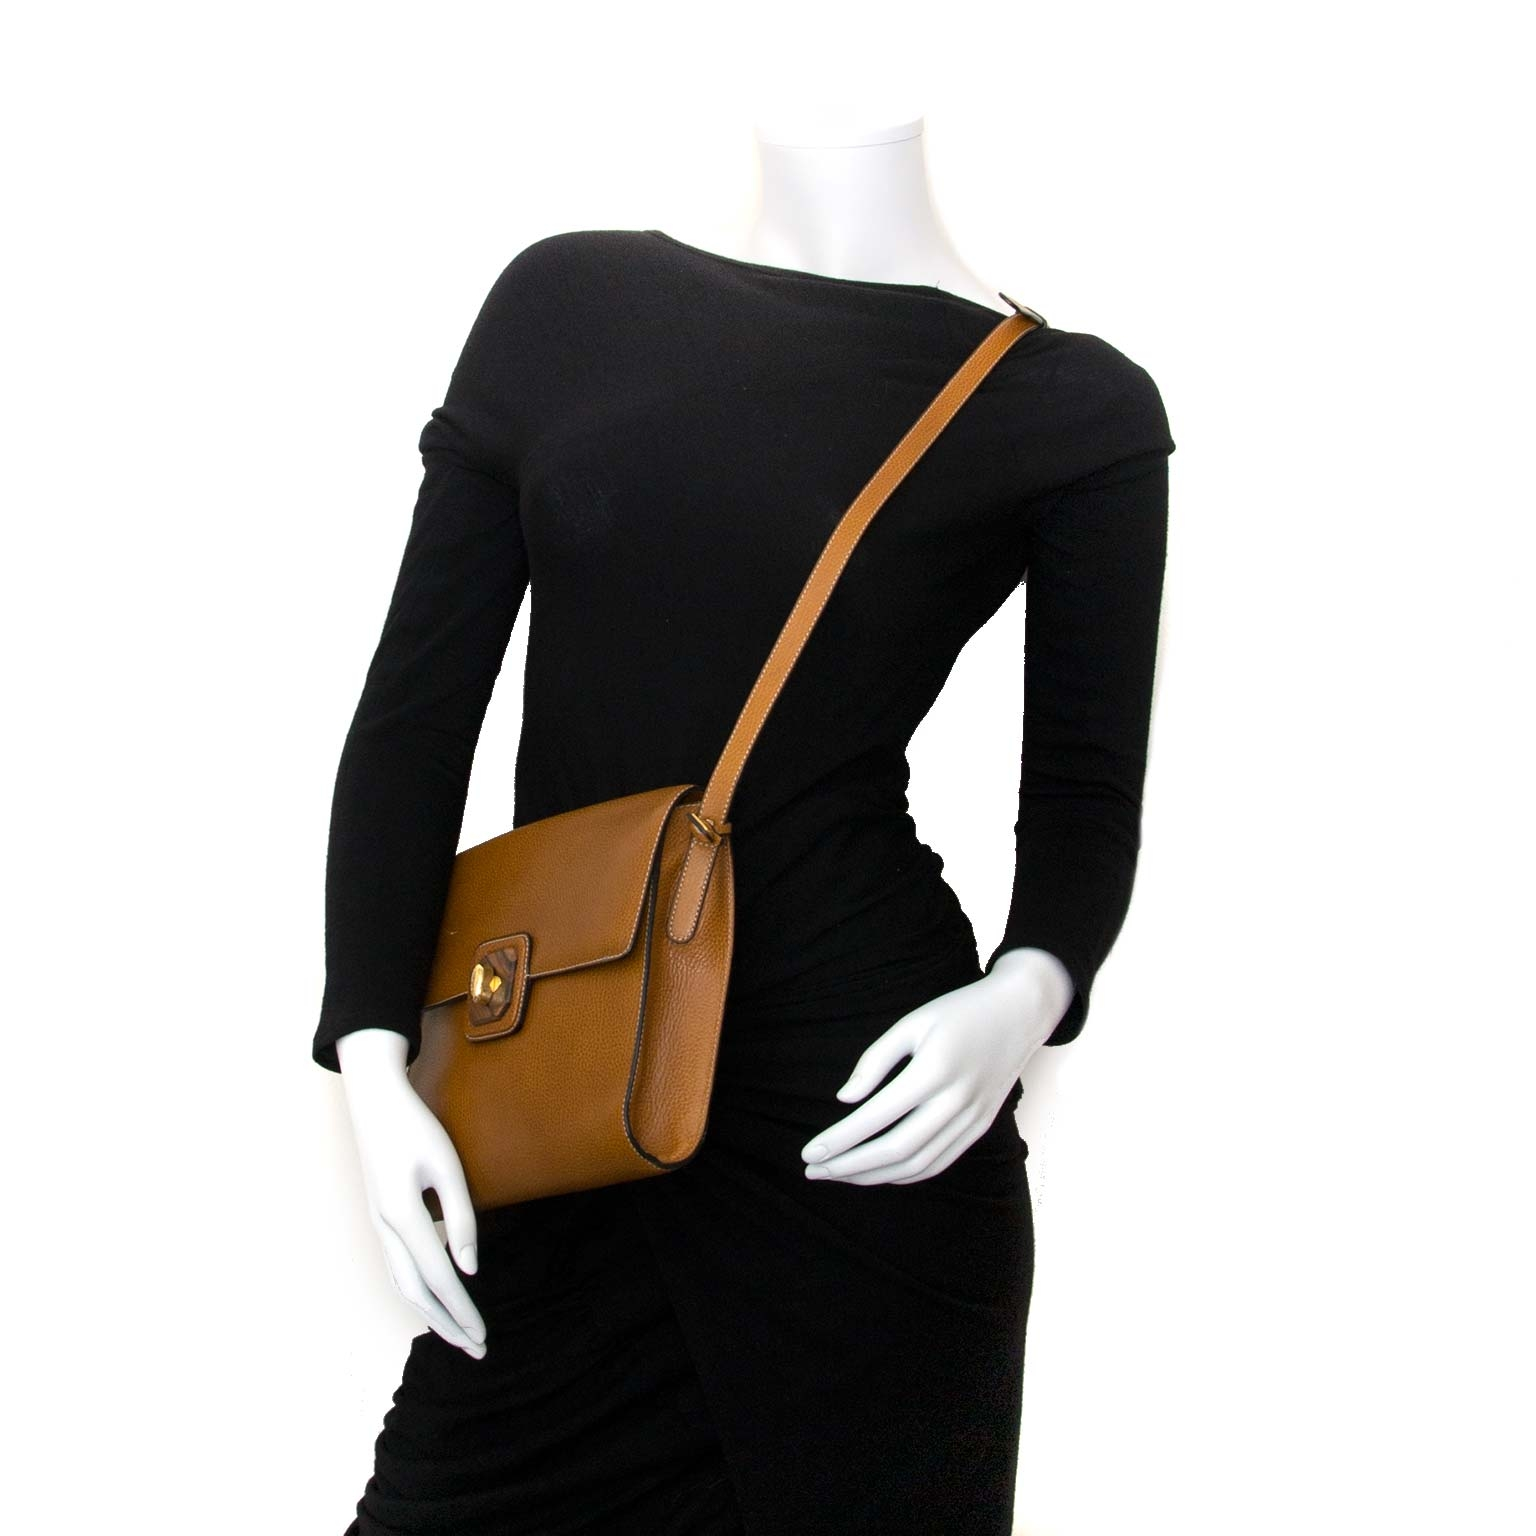 delvaux brown shoulder bag wooden turnlock now for sale at labellov vintage fashion webshop belgium